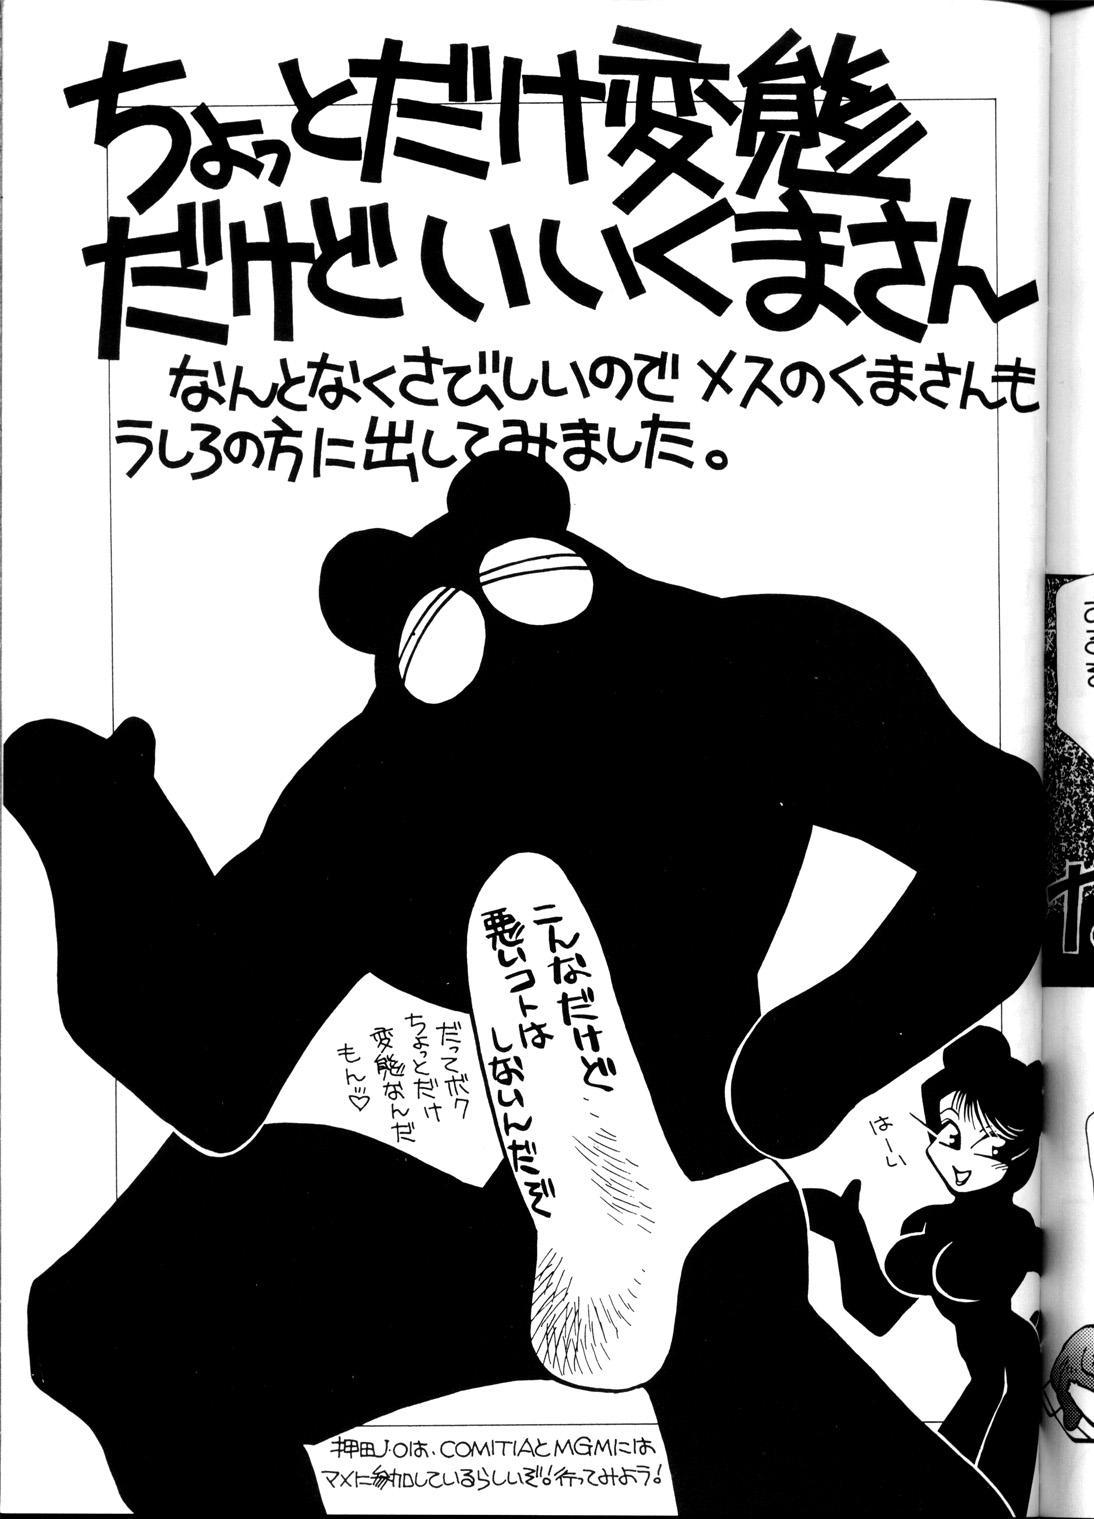 [B.B.C] Tenchi Muyou! Ryou-ou-ki Kaiteiben (Tenchi Muyou!) 63